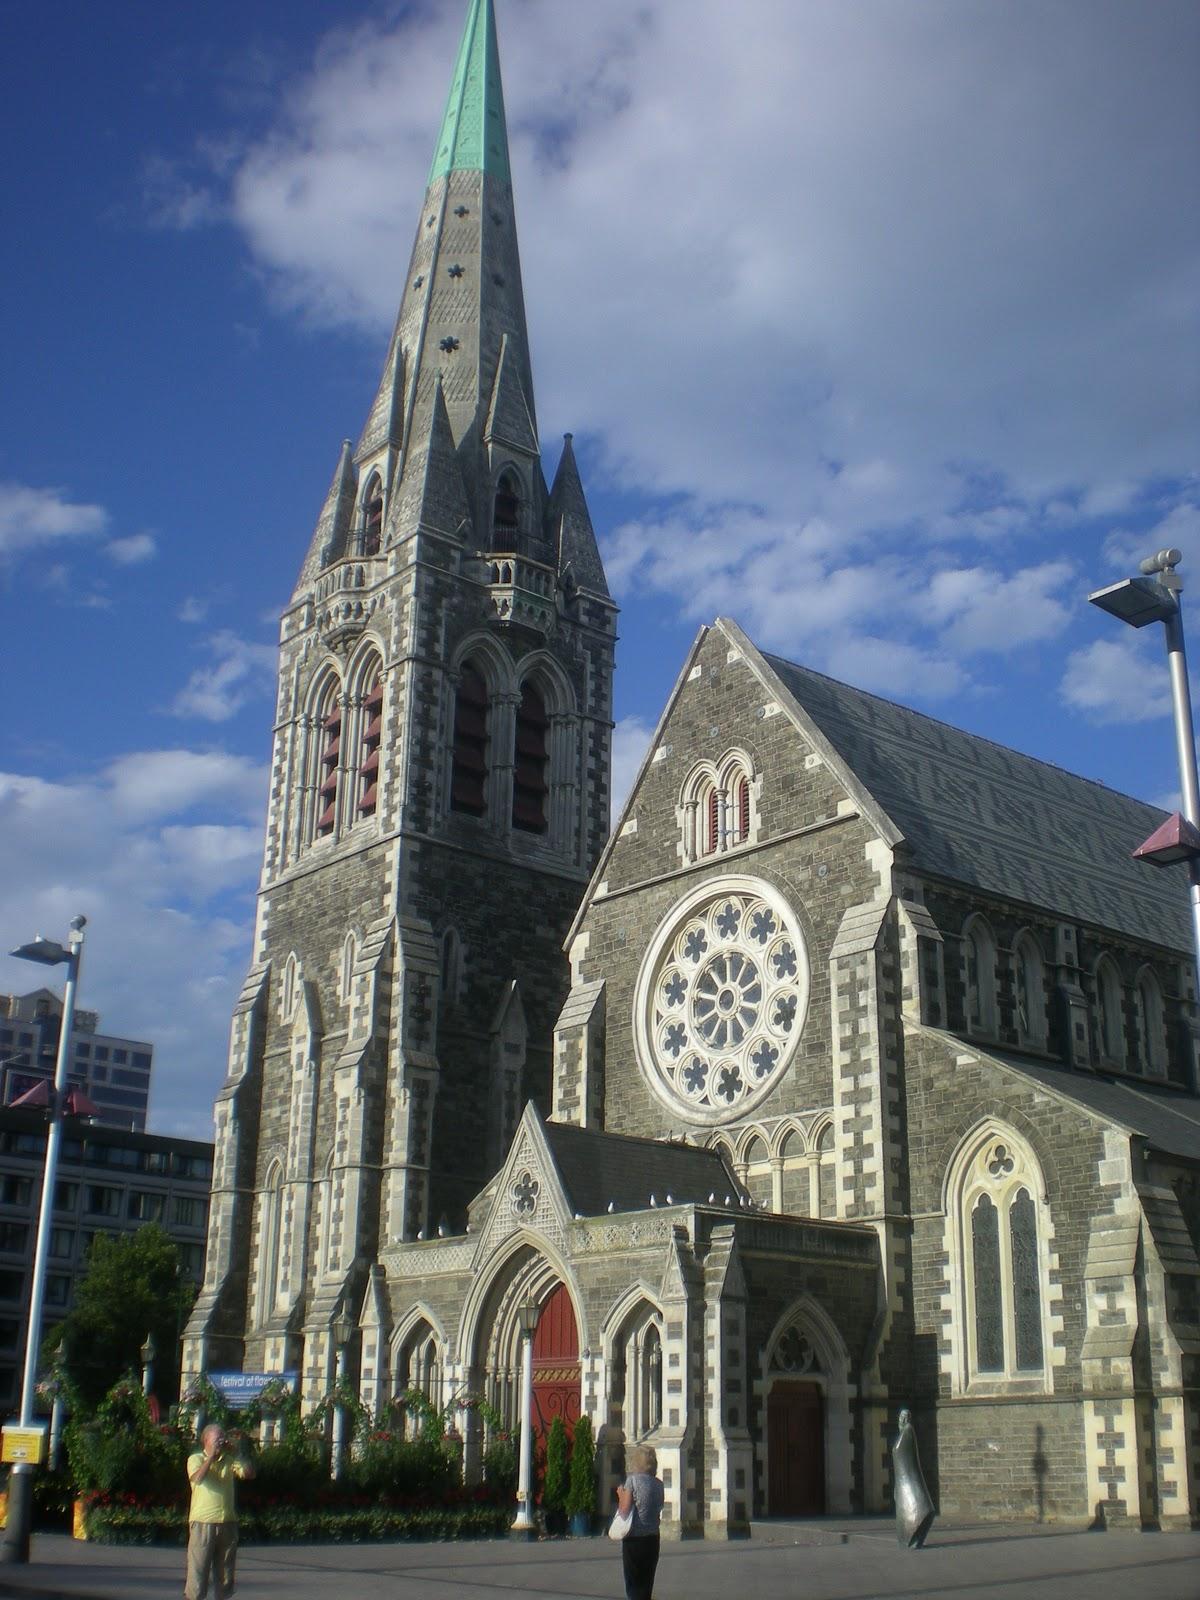 christchurch erdbeben februar 2011